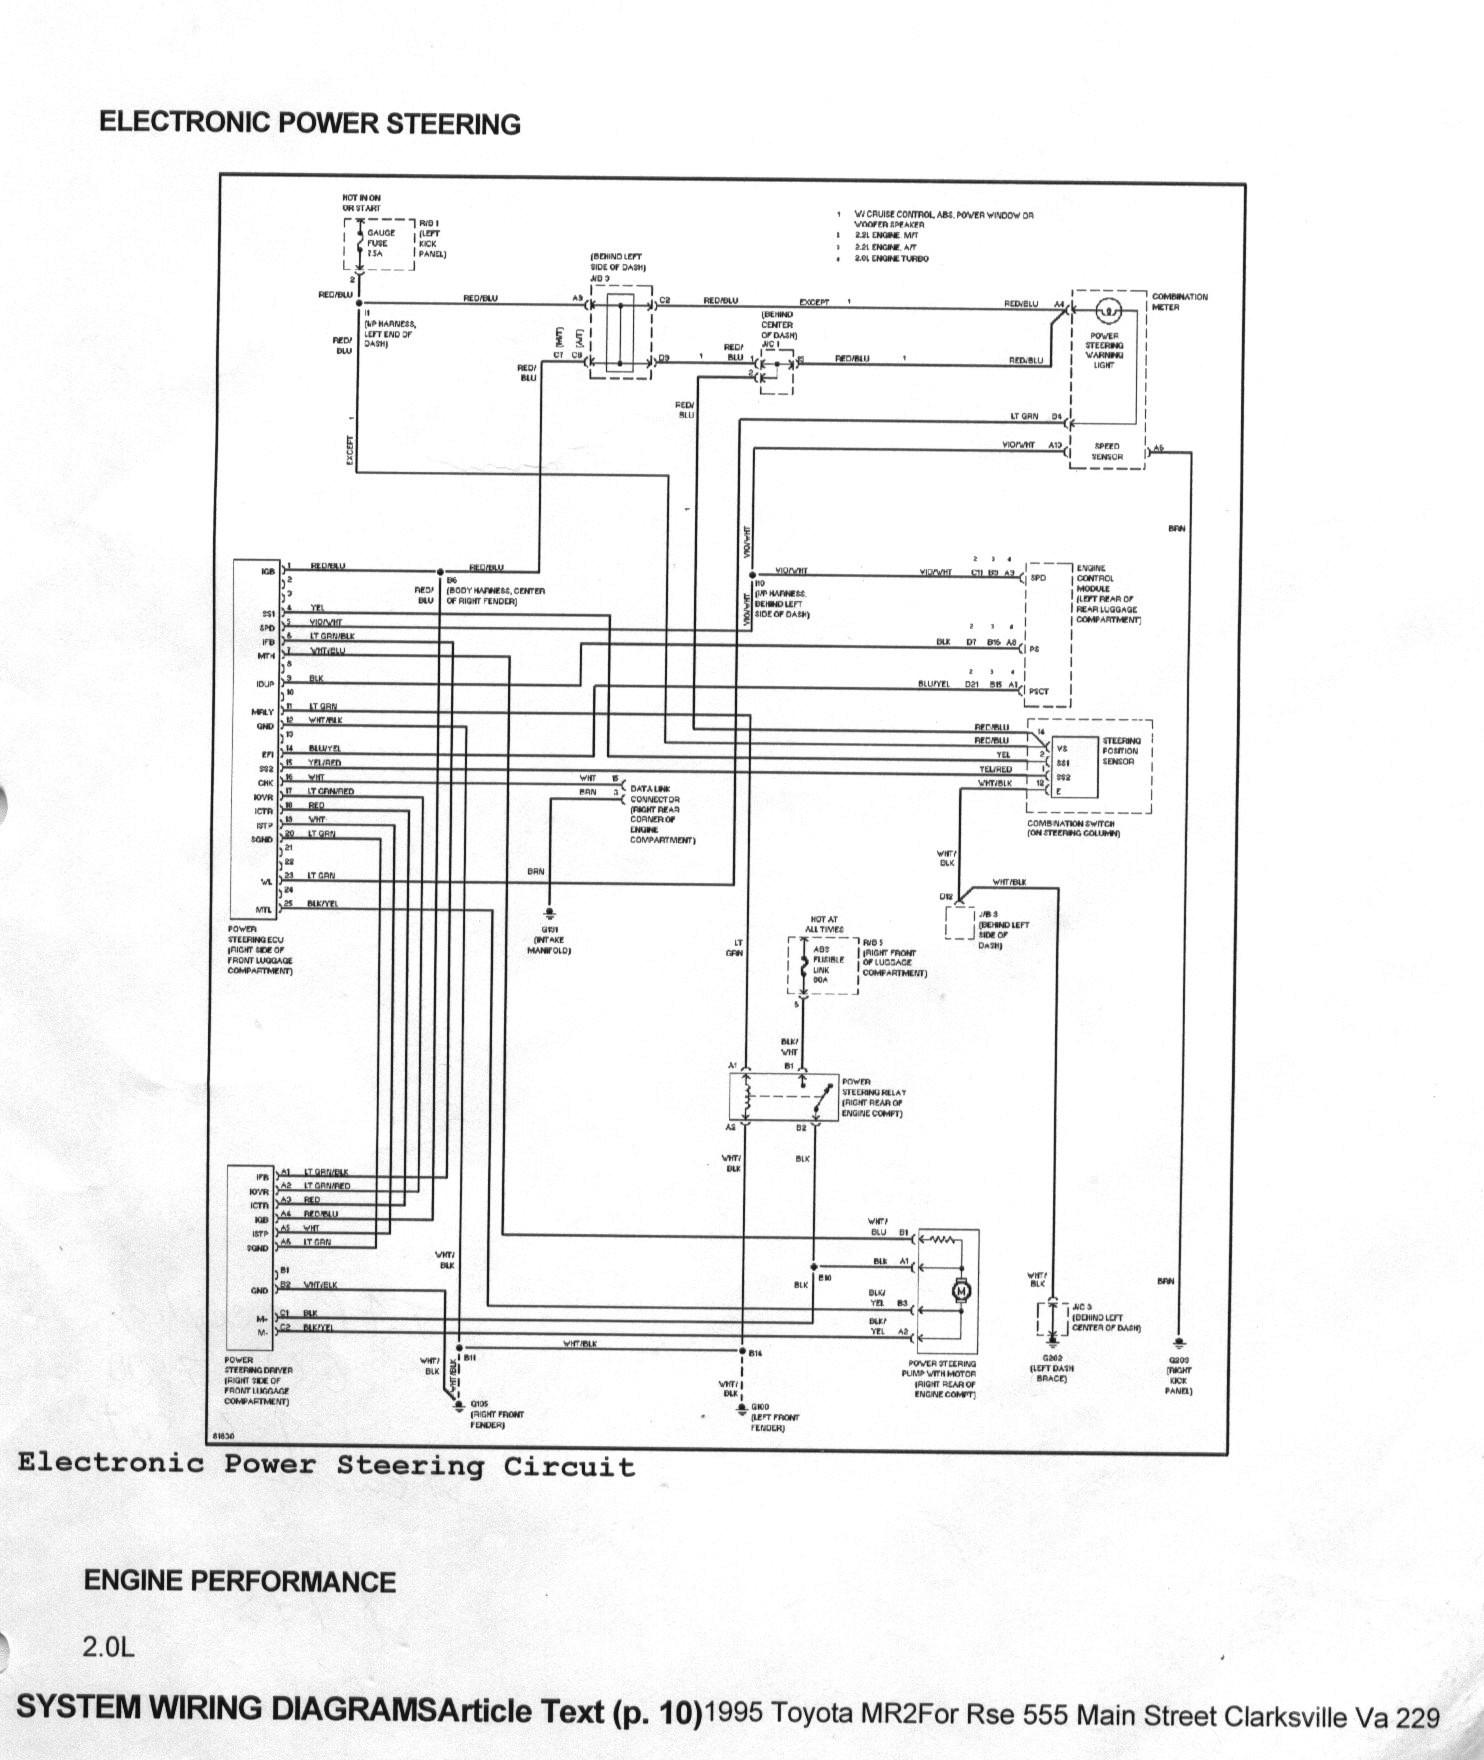 2004 Toyota Rav4 Engine Diagram 1993 Celica Wiring Supra Html